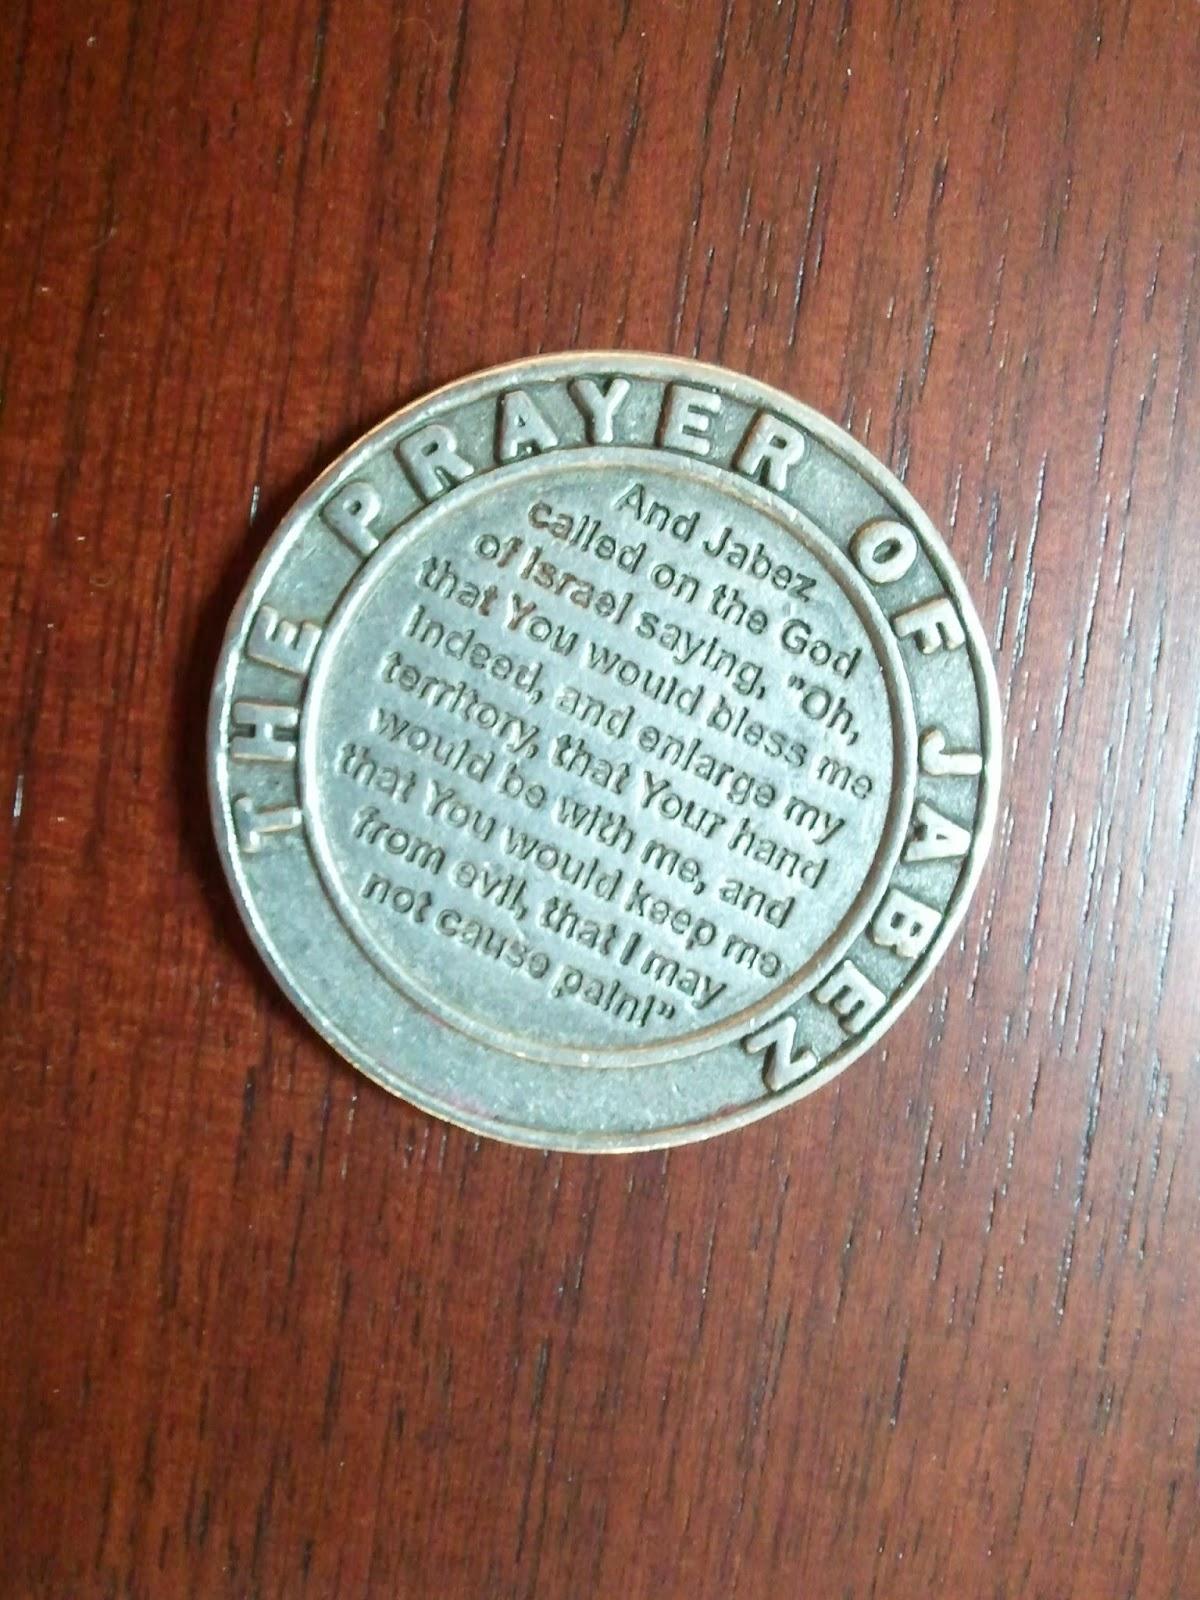 WARNING: Dangerous Prayer Ahead | awkwardly graceful